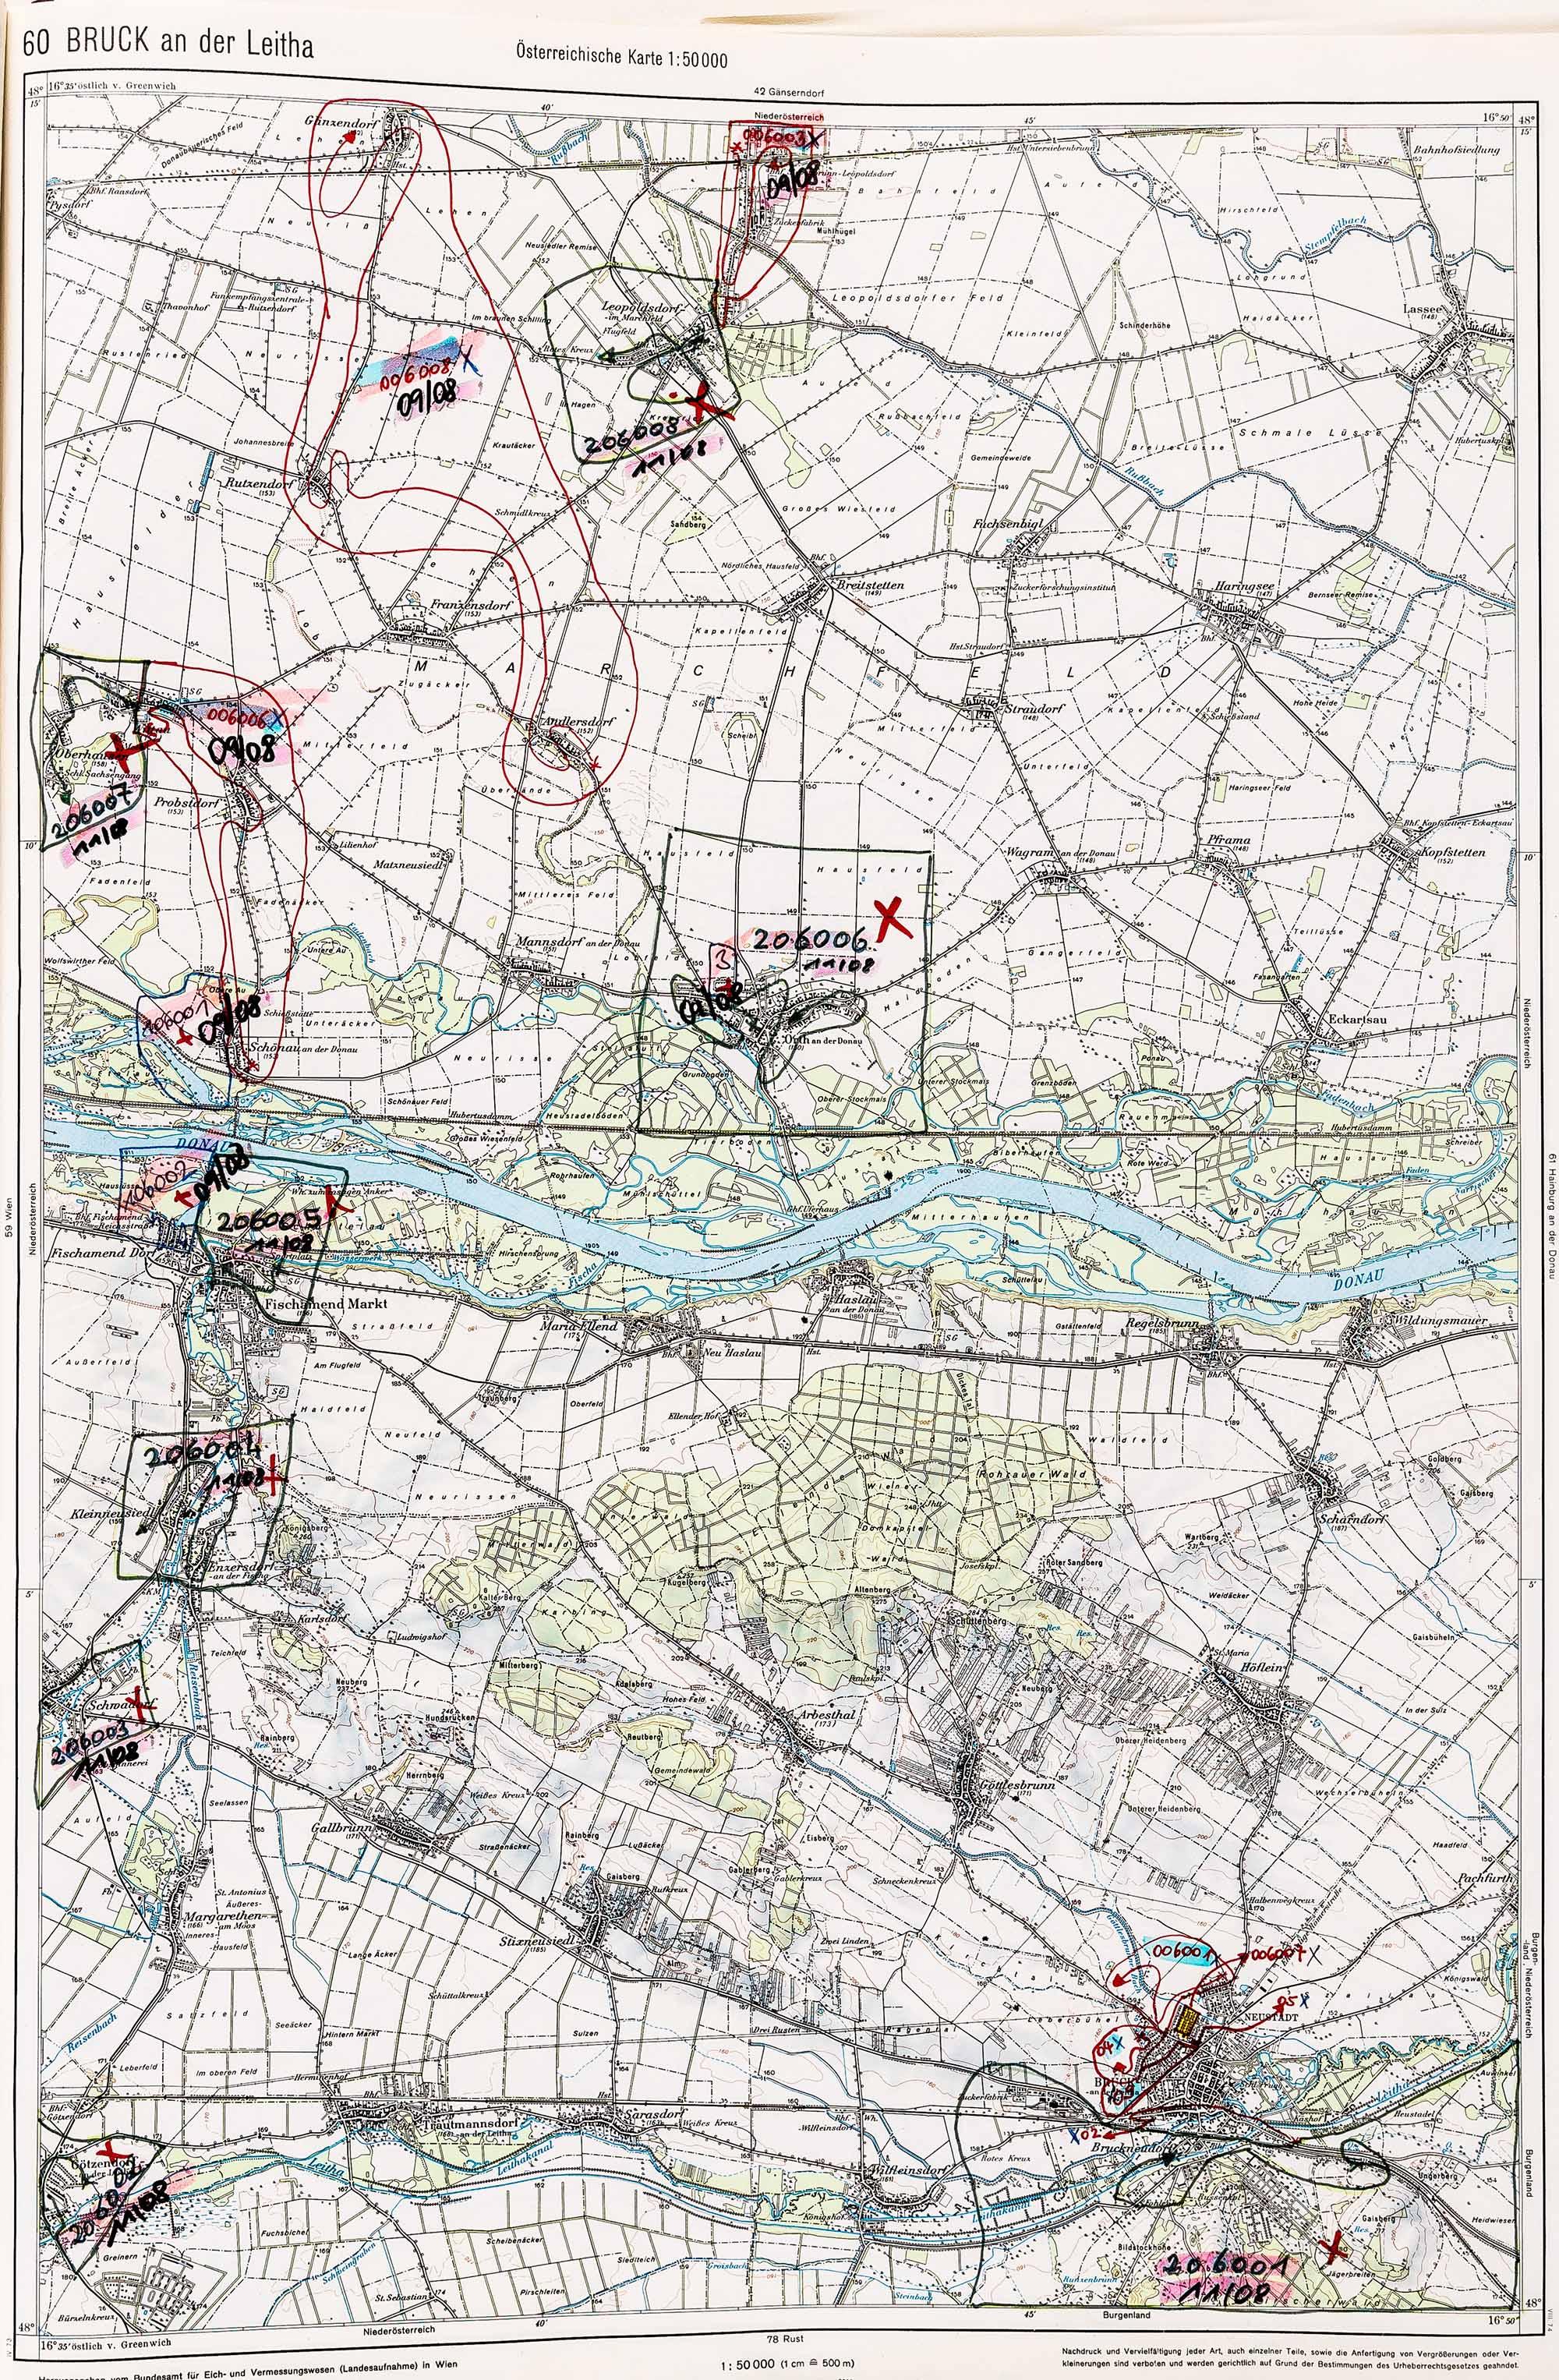 1979-1982 Karte 060